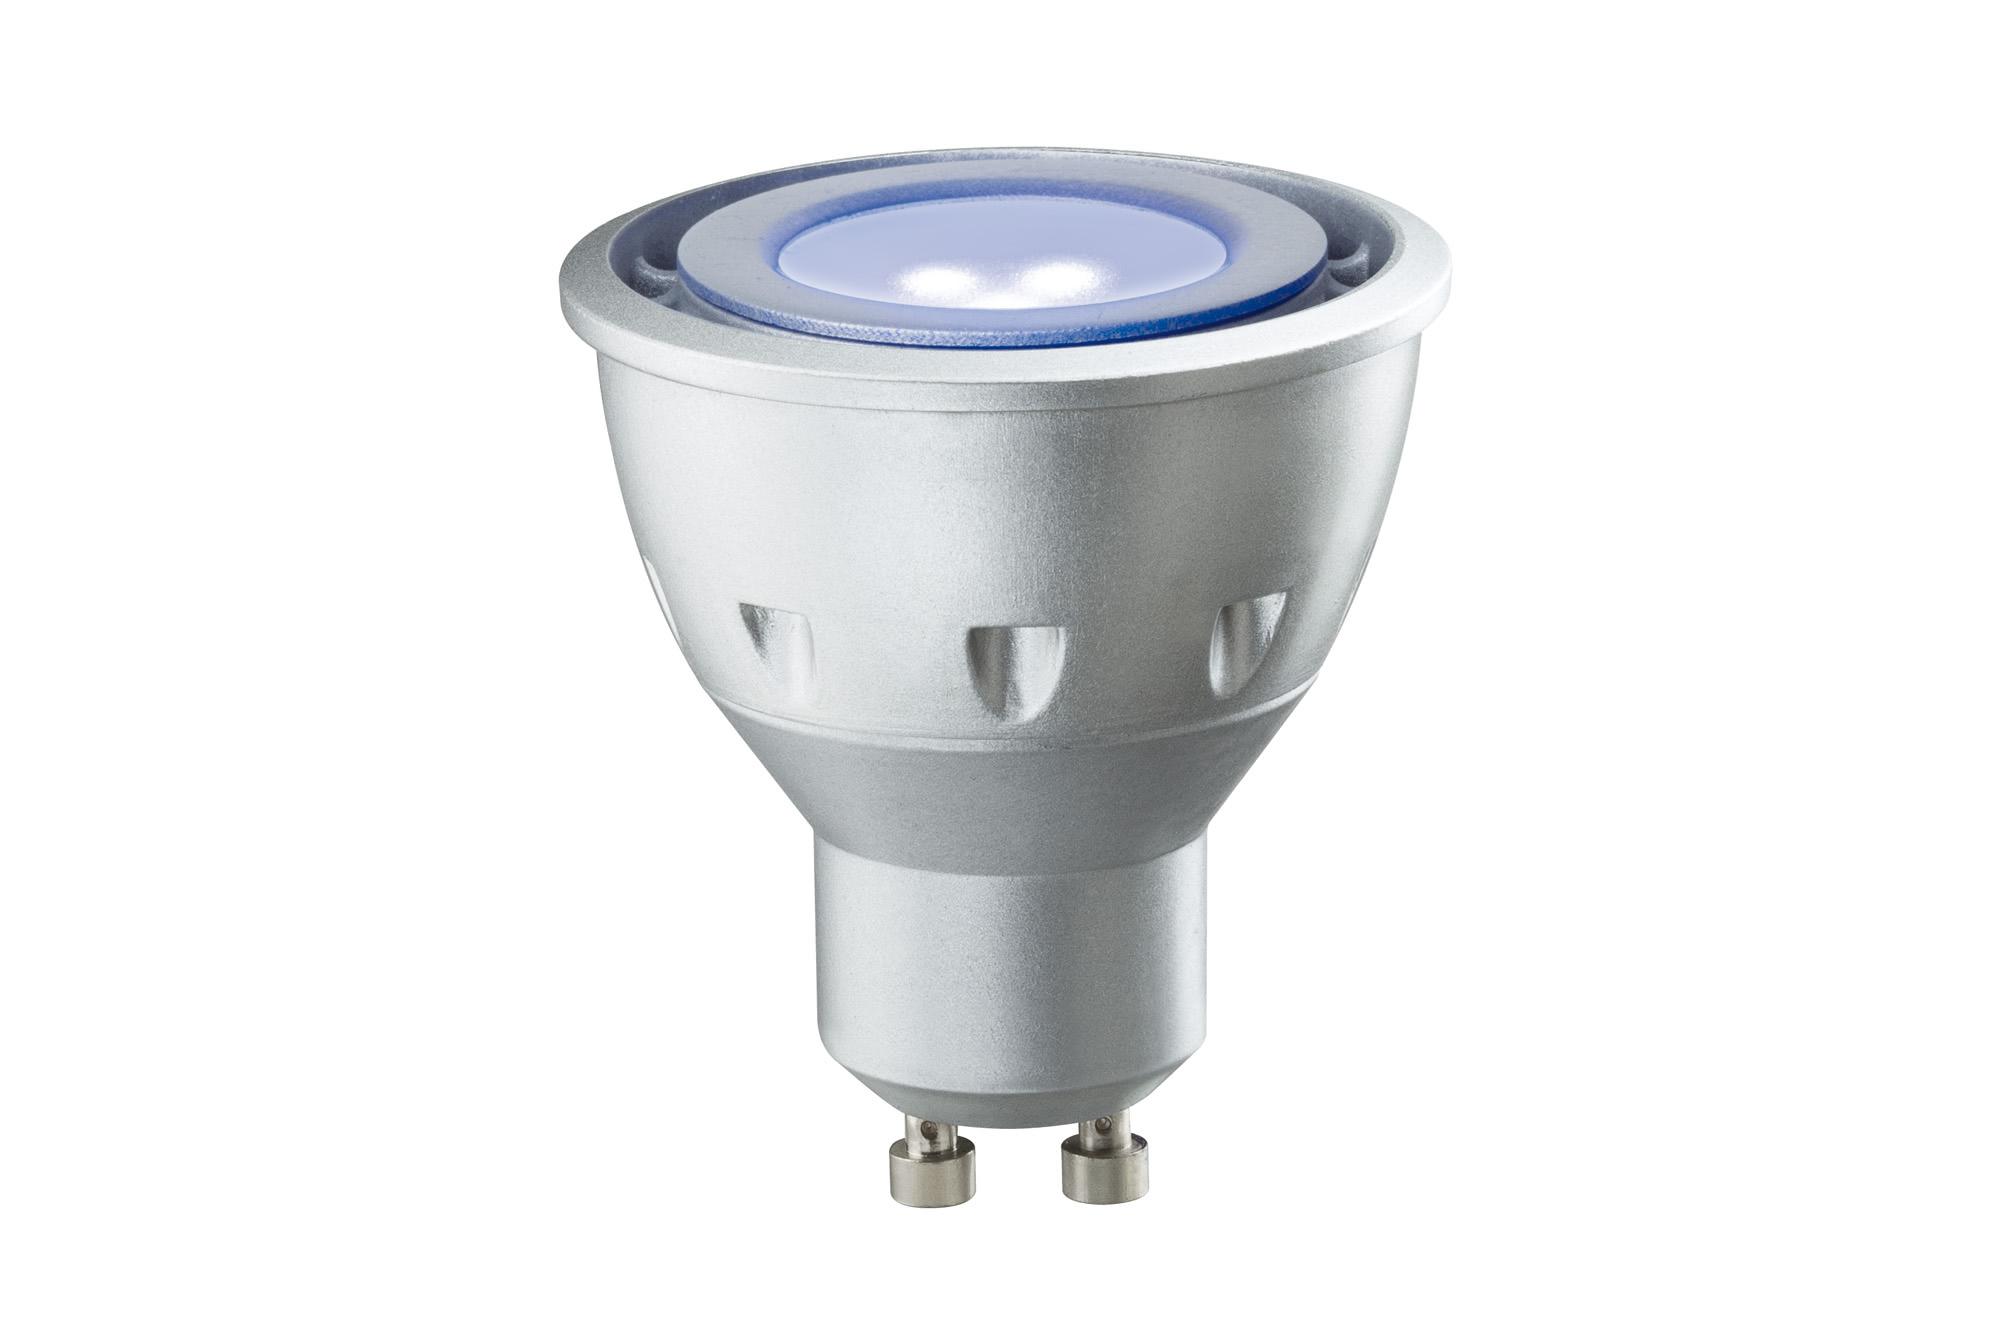 Paulmann. 28216 LED Reflektor 4,5W GU10 230V Blacklight